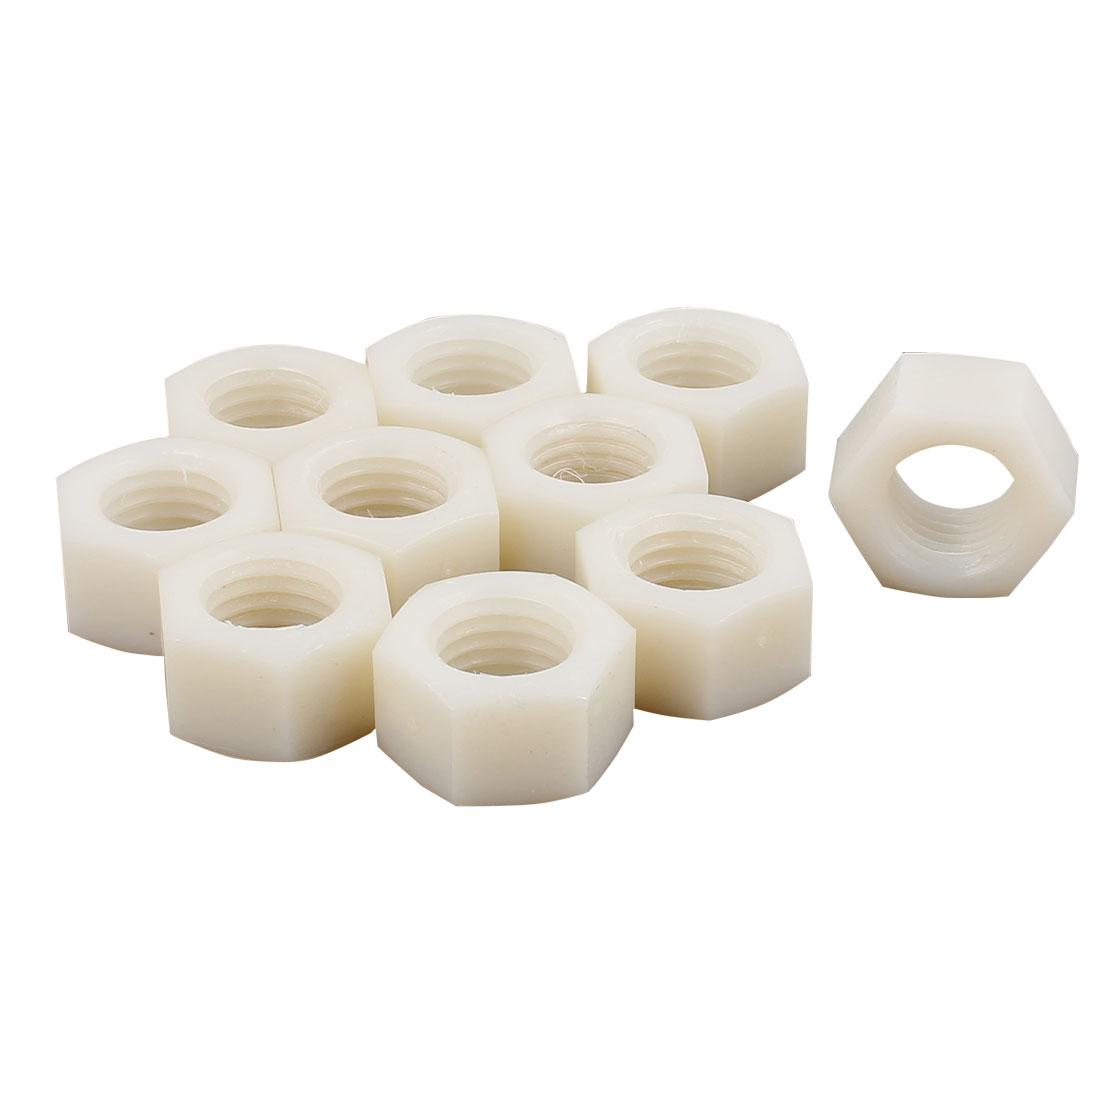 10pcs Pack Of Metric M20 Insert Lock Nylon Full Hex Nuts Nylon Off-White